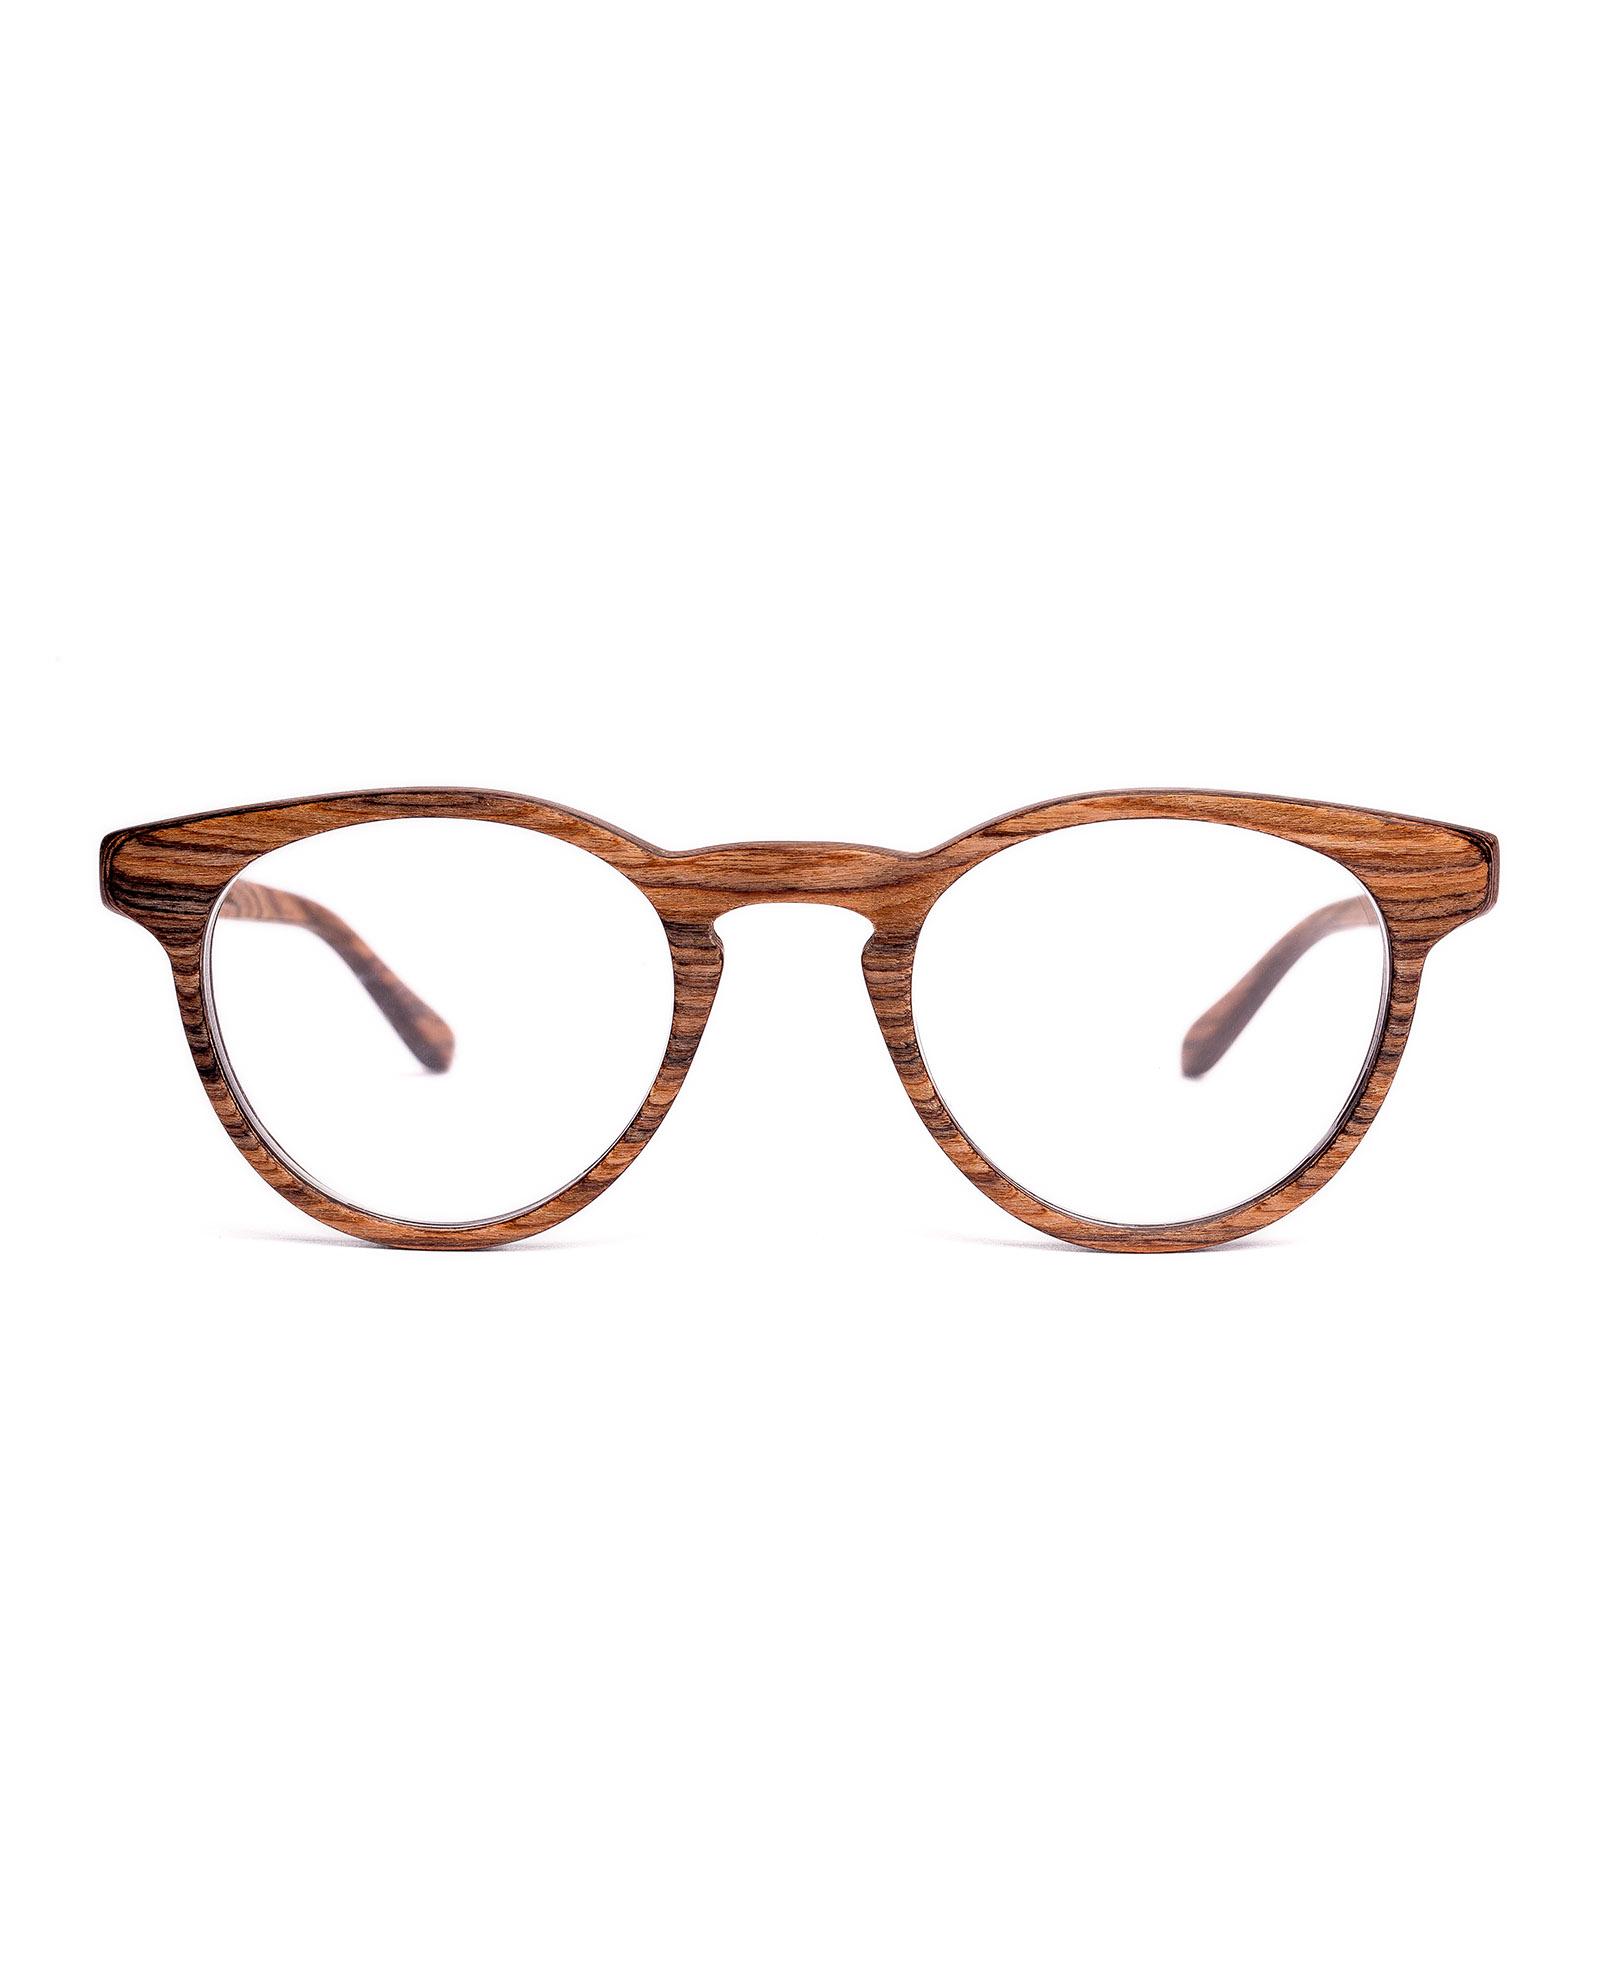 25e7773fdc London Live - Wooden Glasses - Woodiu